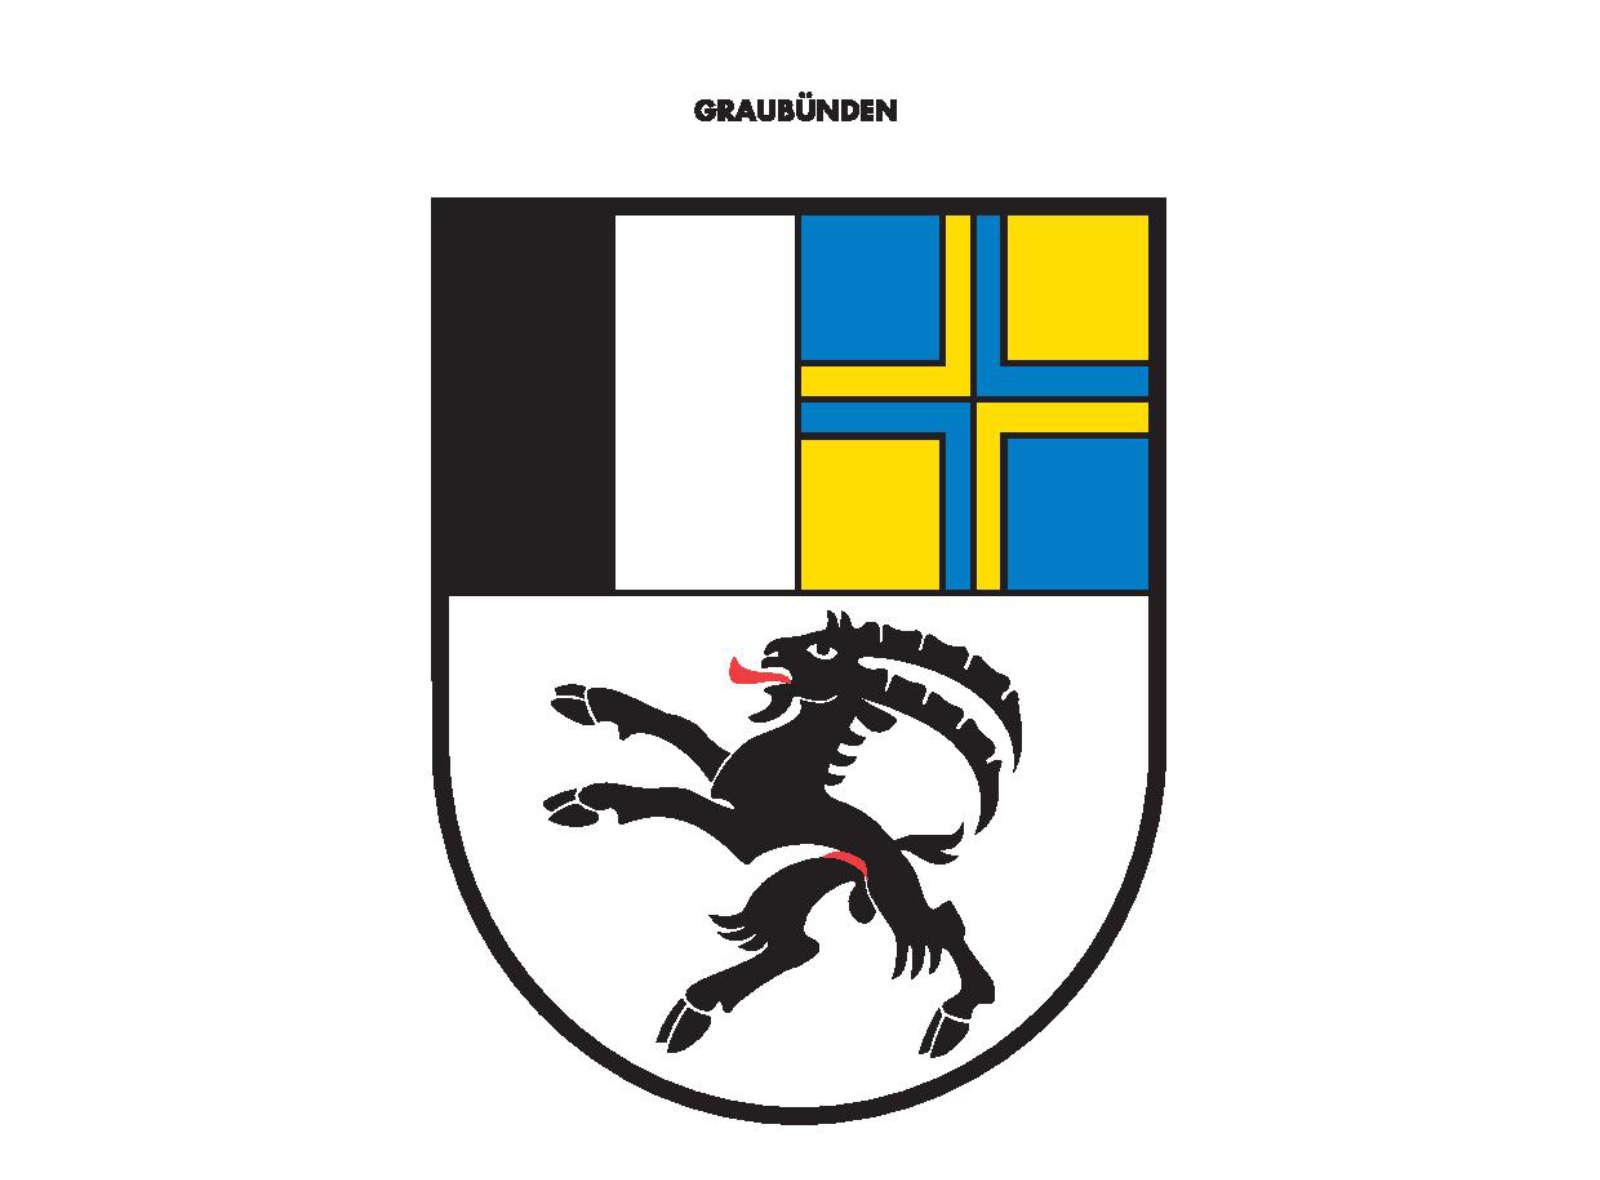 Made in Graubnden - Graduate School Graubnden